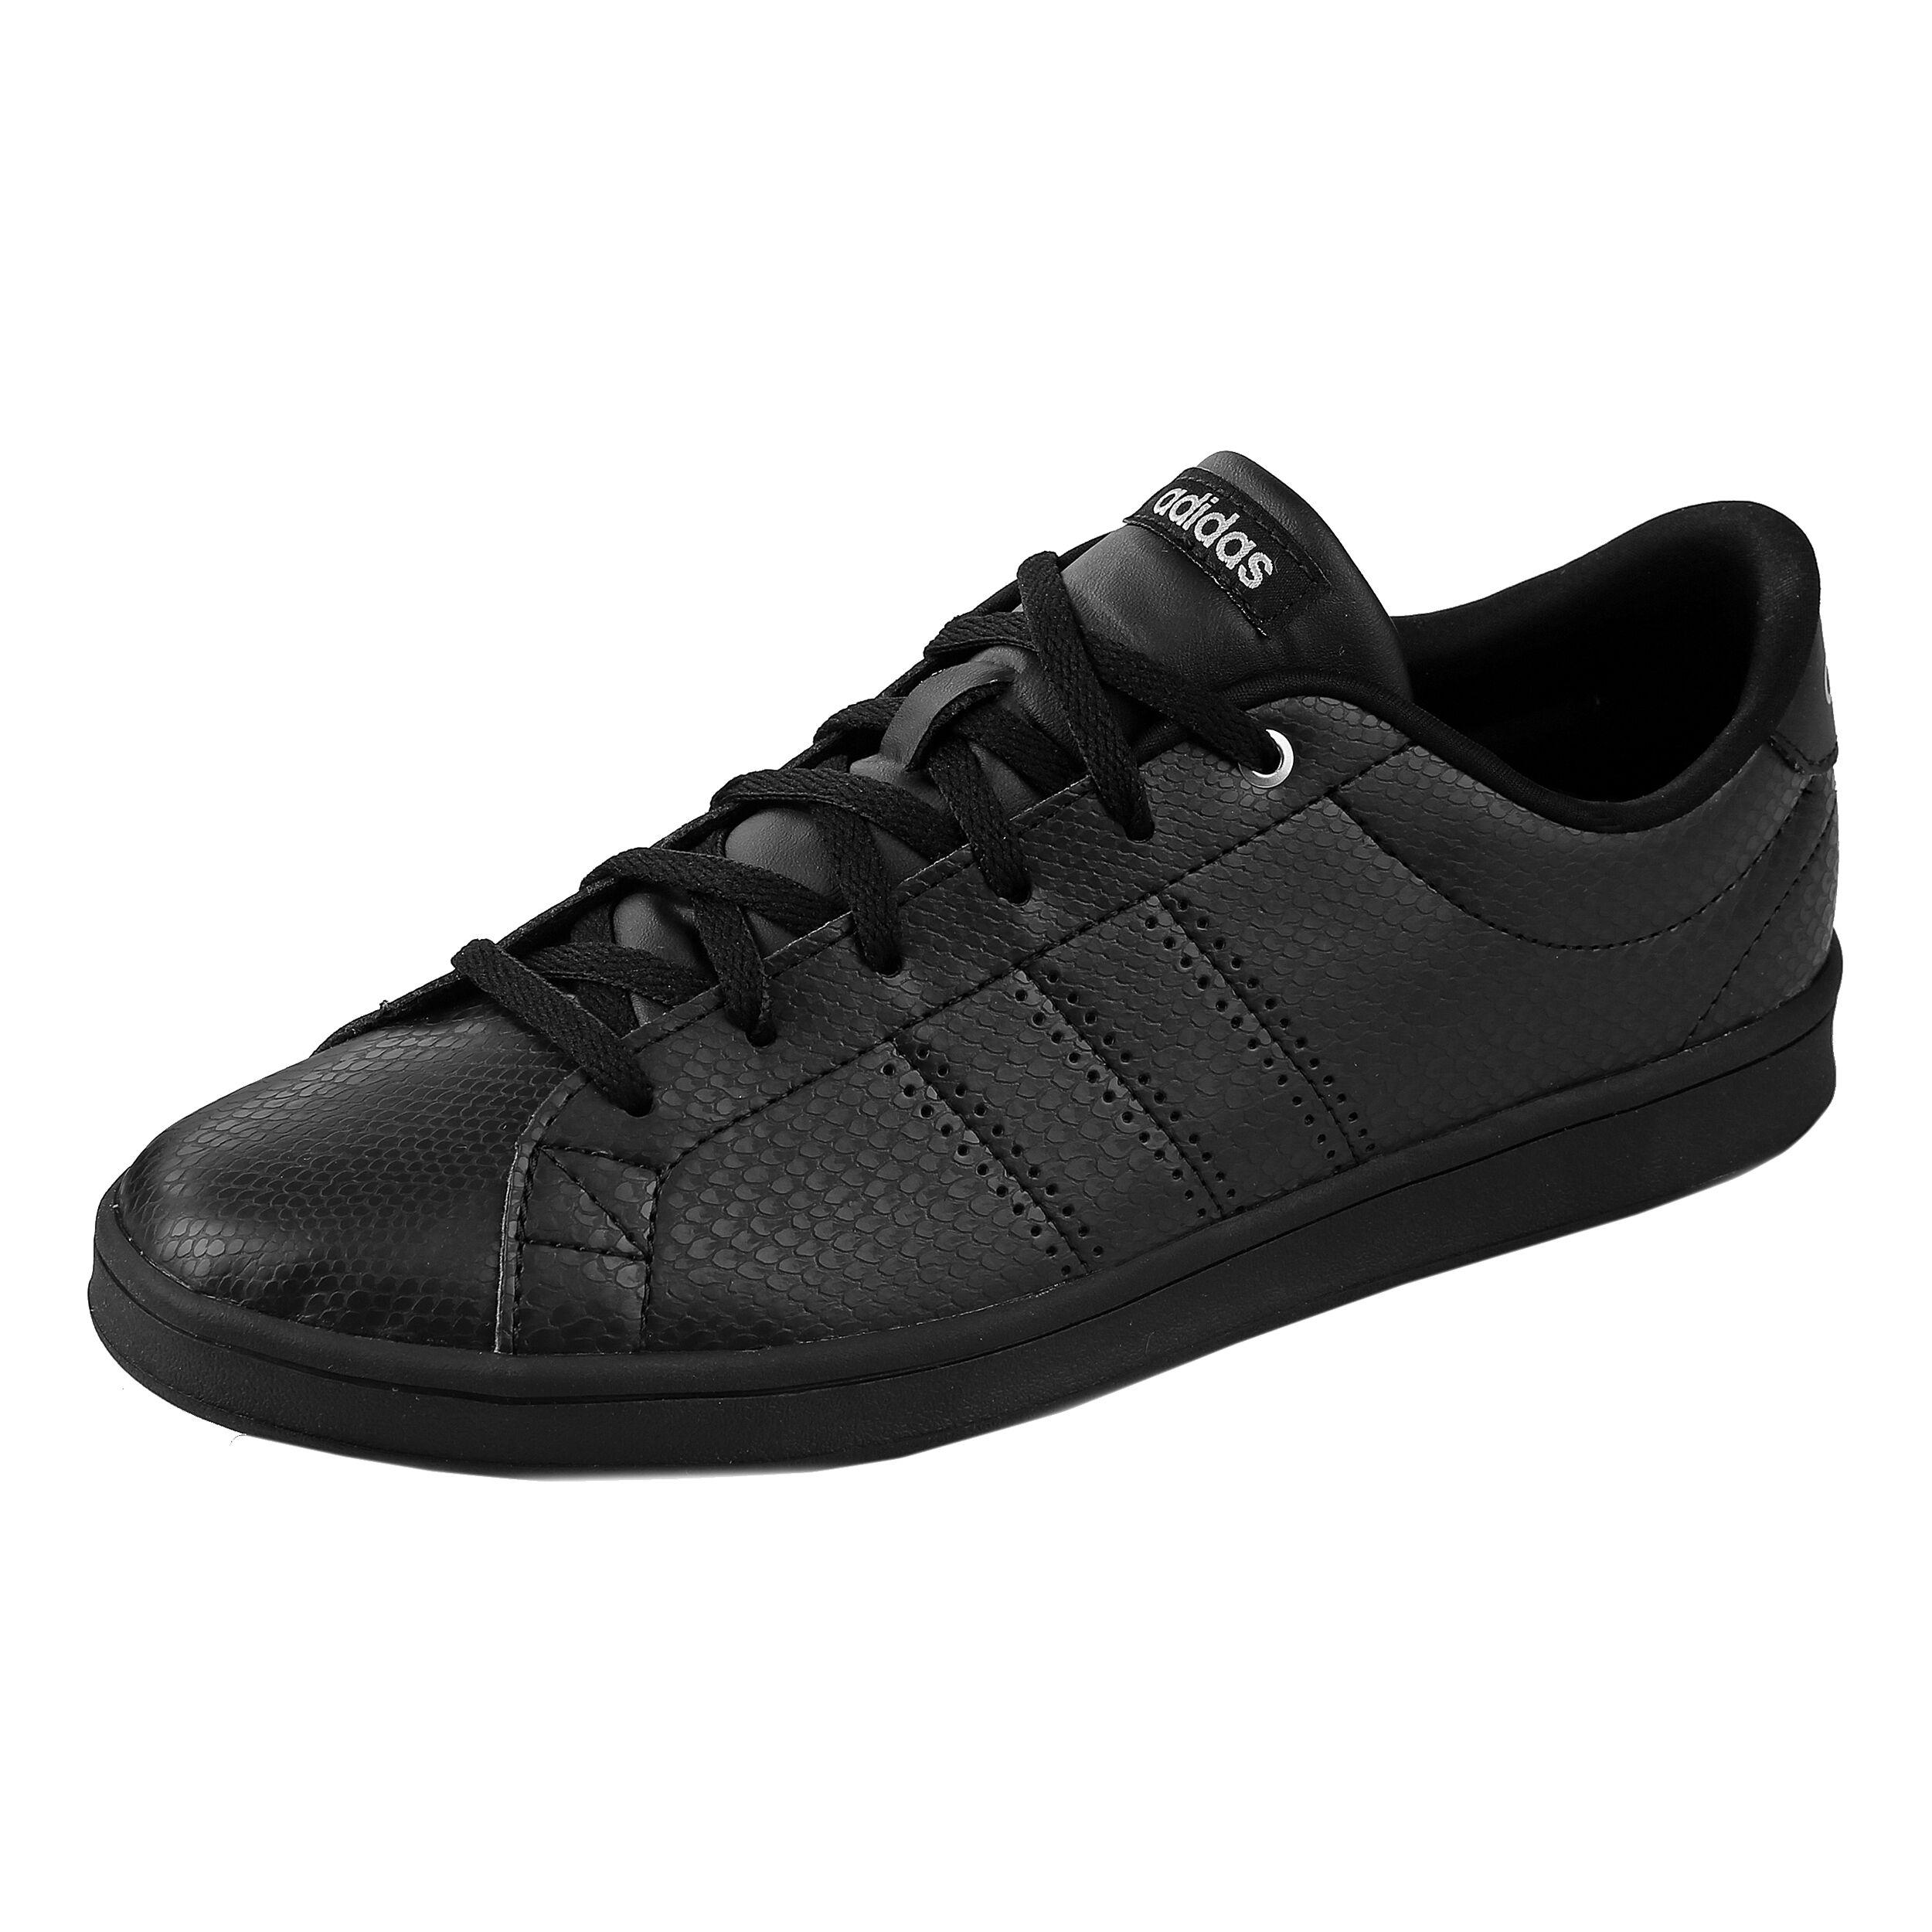 adidas Advantage Clean QT Sneaker Damen - Schwarz, Silber